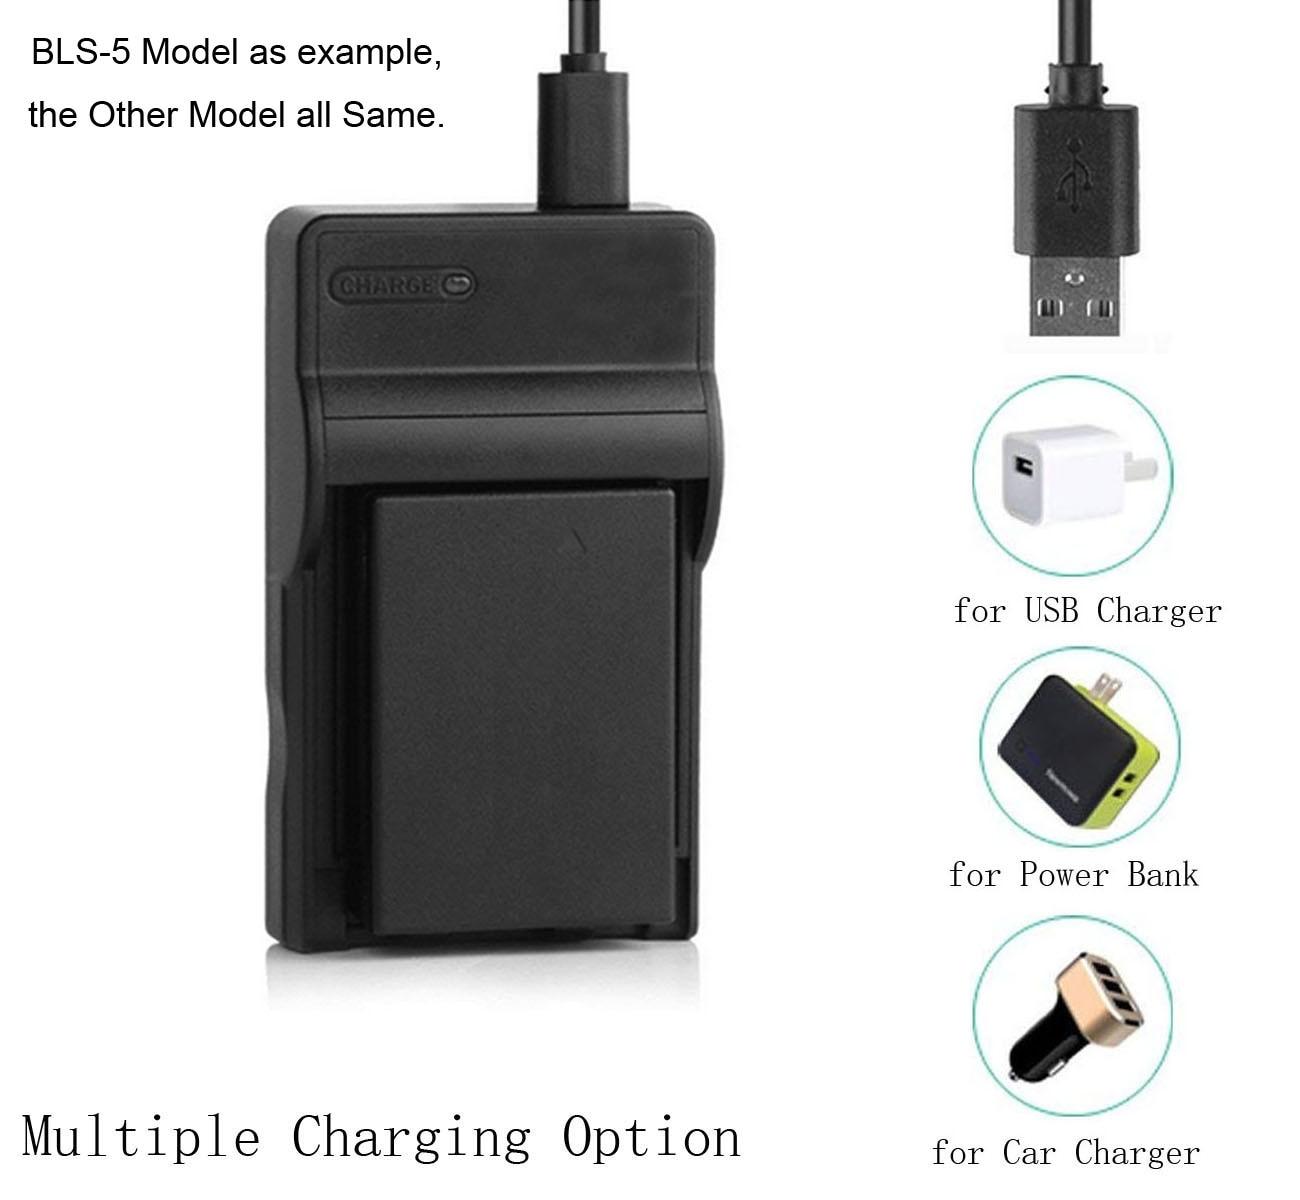 GZ-E305WEU GZ-E305SEU Full HD Memory Camcorder GZ-E305WE GZ-E305SE LCD USB Battery Charger for JVC Everio GZ-E305